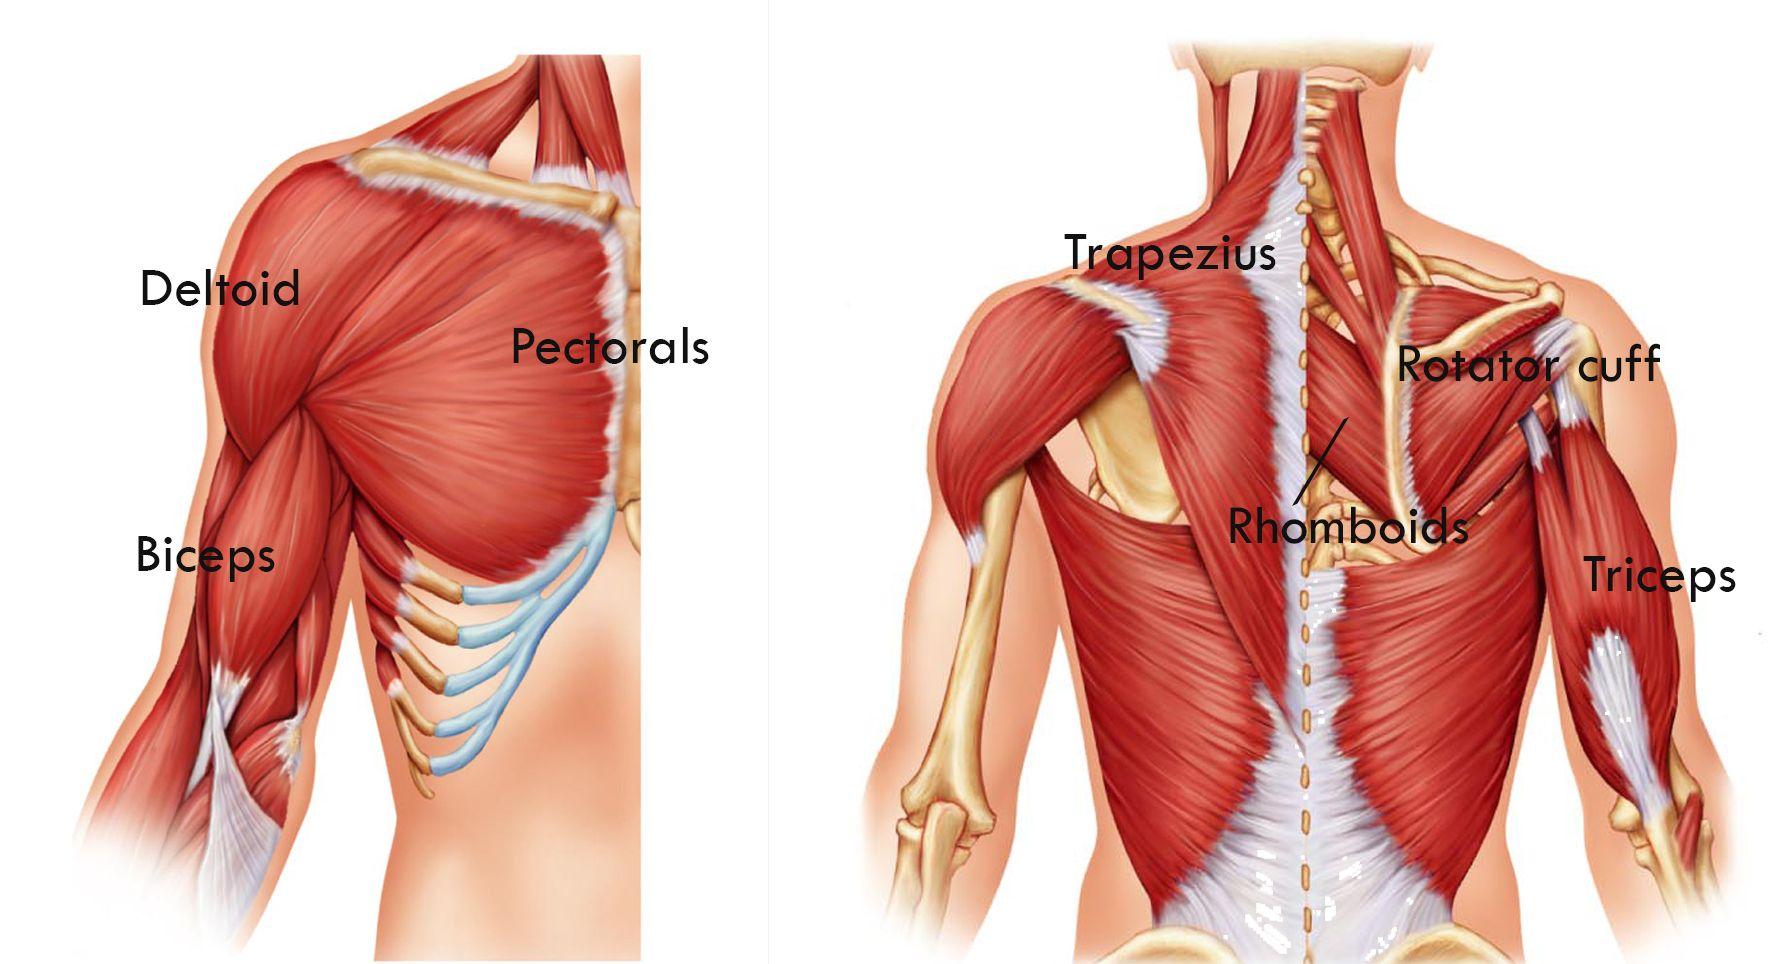 Exercises for the upper body muscles | OT Study Material | Pinterest ...